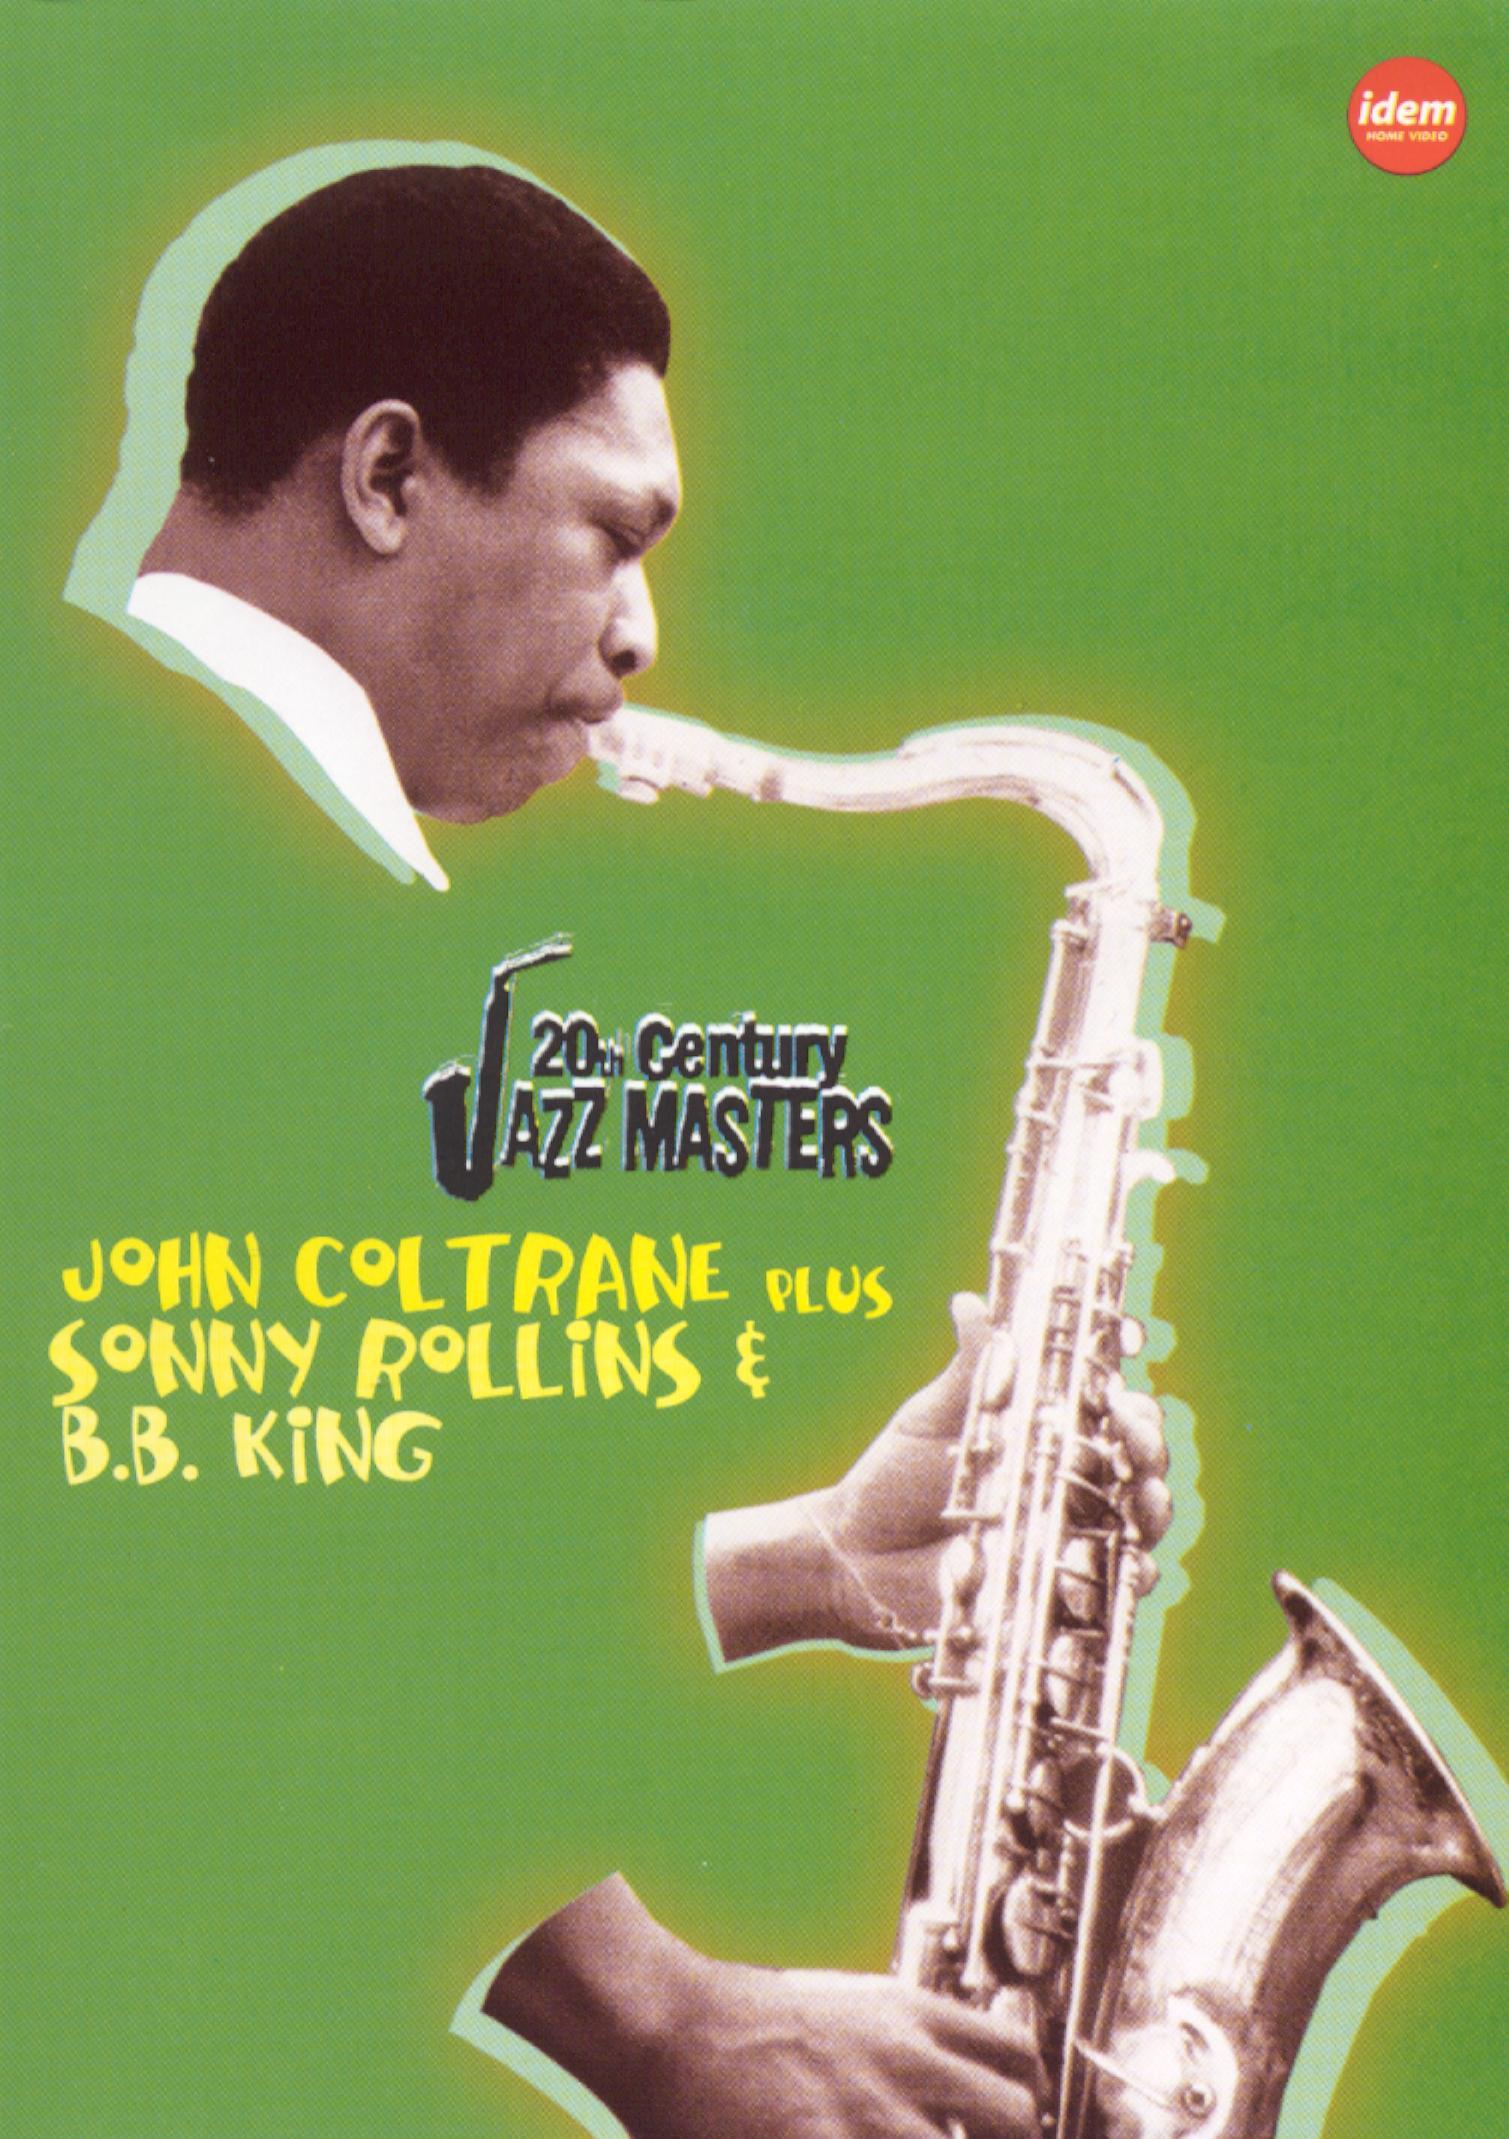 20th Century Jazz Masters: John Coltrane/Sonny Rollins/B.B. King